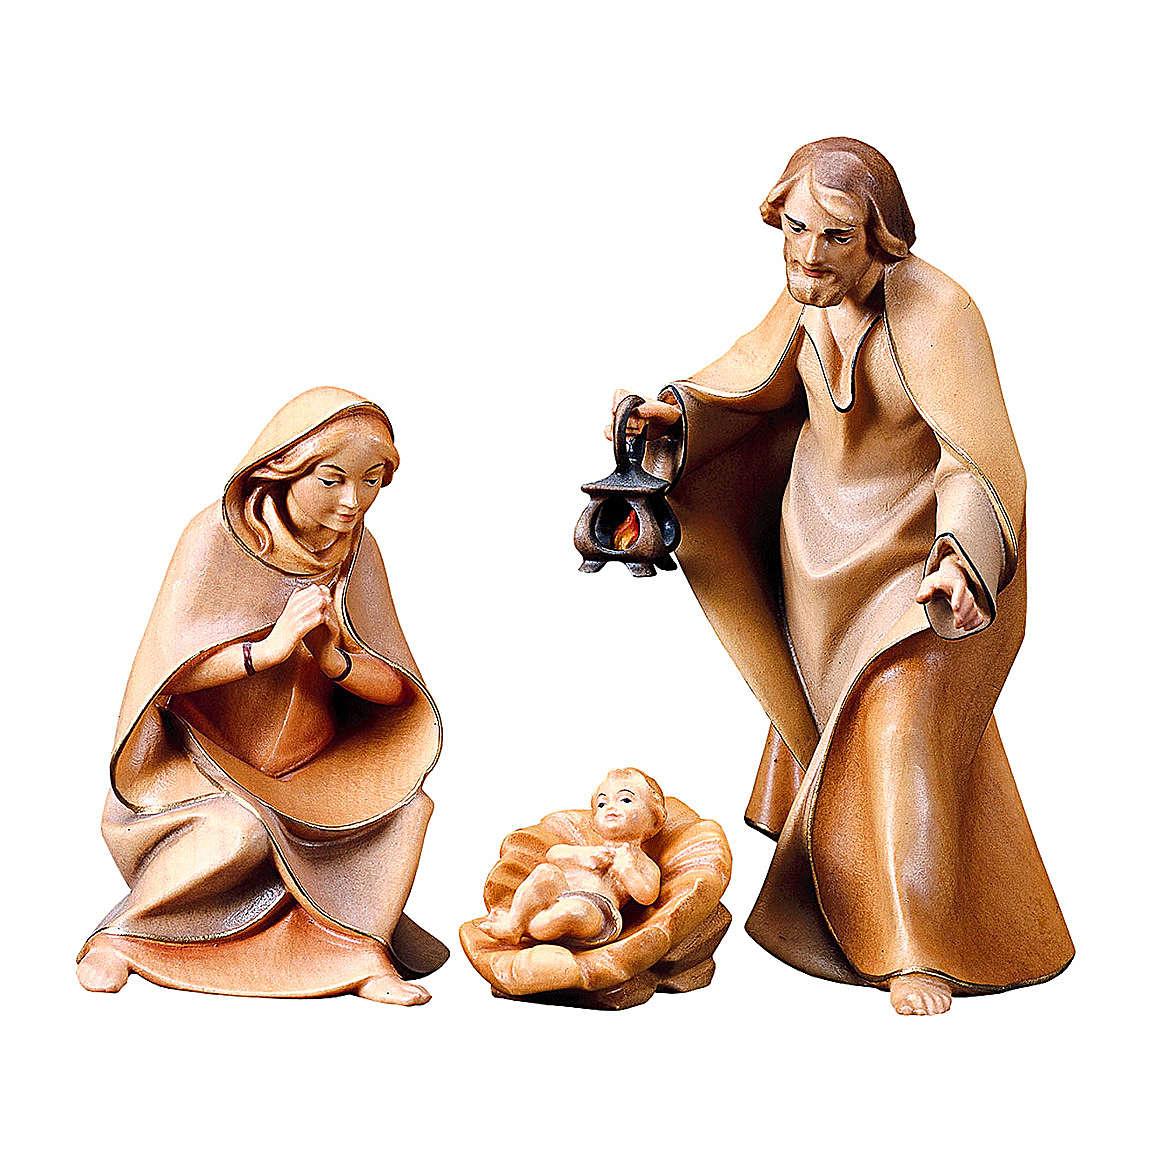 Sacra famiglia per presepe Original Redentore legno dipinto in Valgardena 12 cm 4 pezzi 4